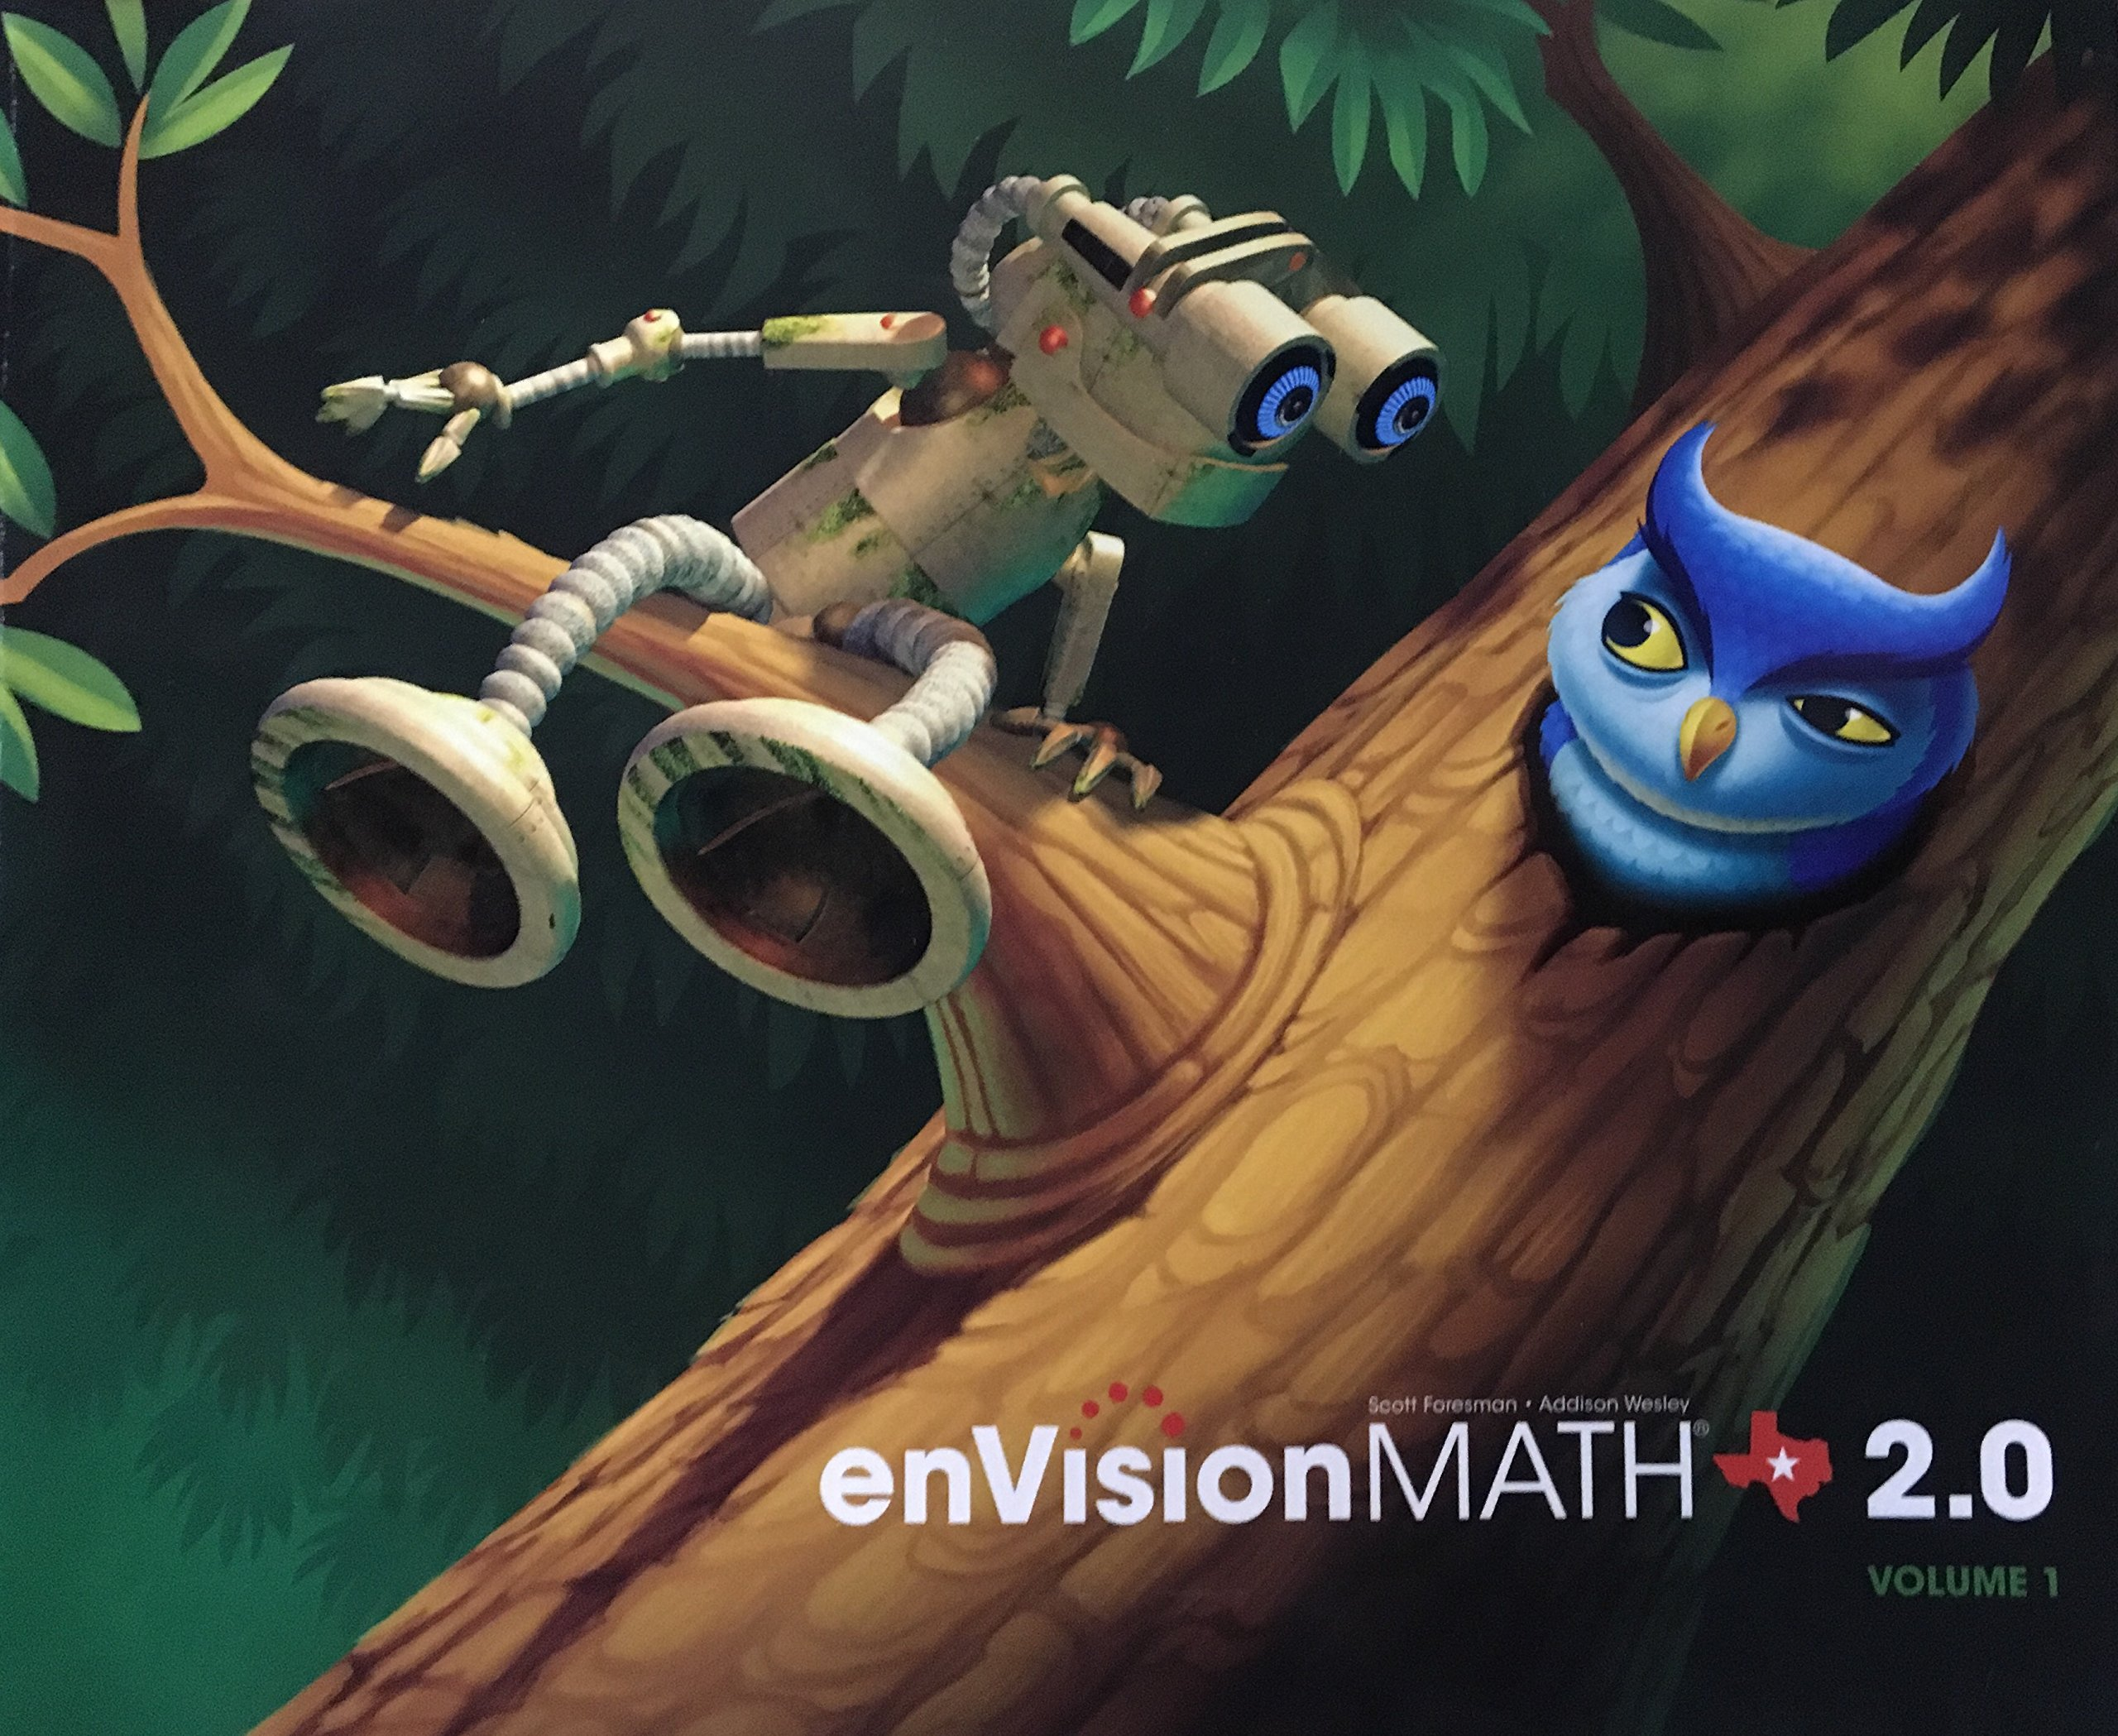 Download enVision Math 2.0, Grade 1, Volume 1, Texas State Edition, 9780328767205, 0328767204, 2015 pdf